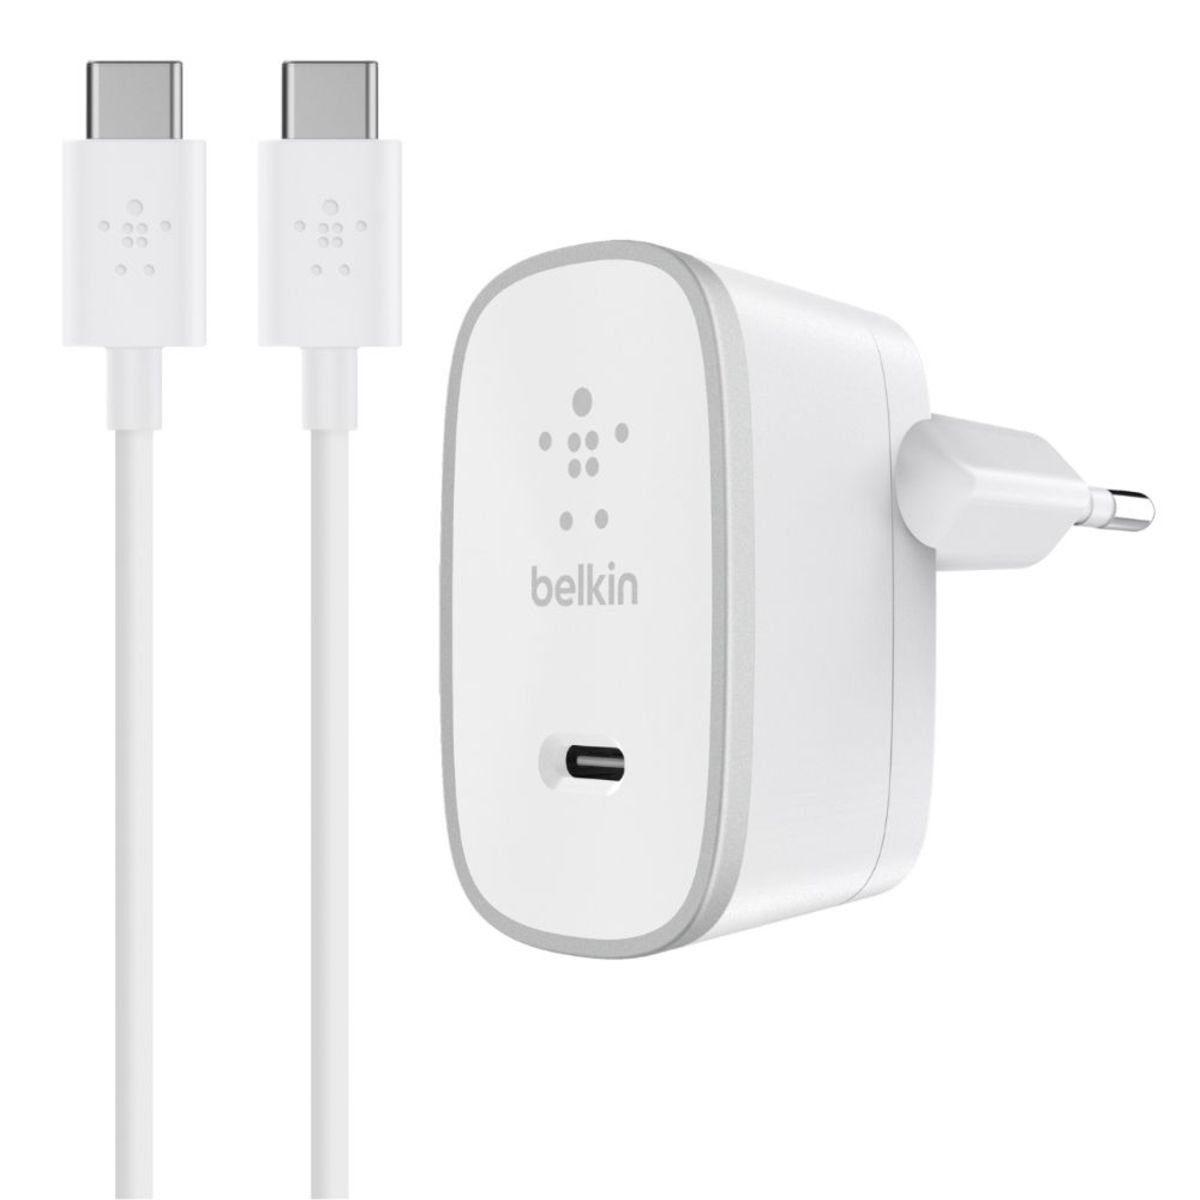 Belkin Lader »USB-C Netzlladegerät inkl. 1.5m USB-C Kabel«